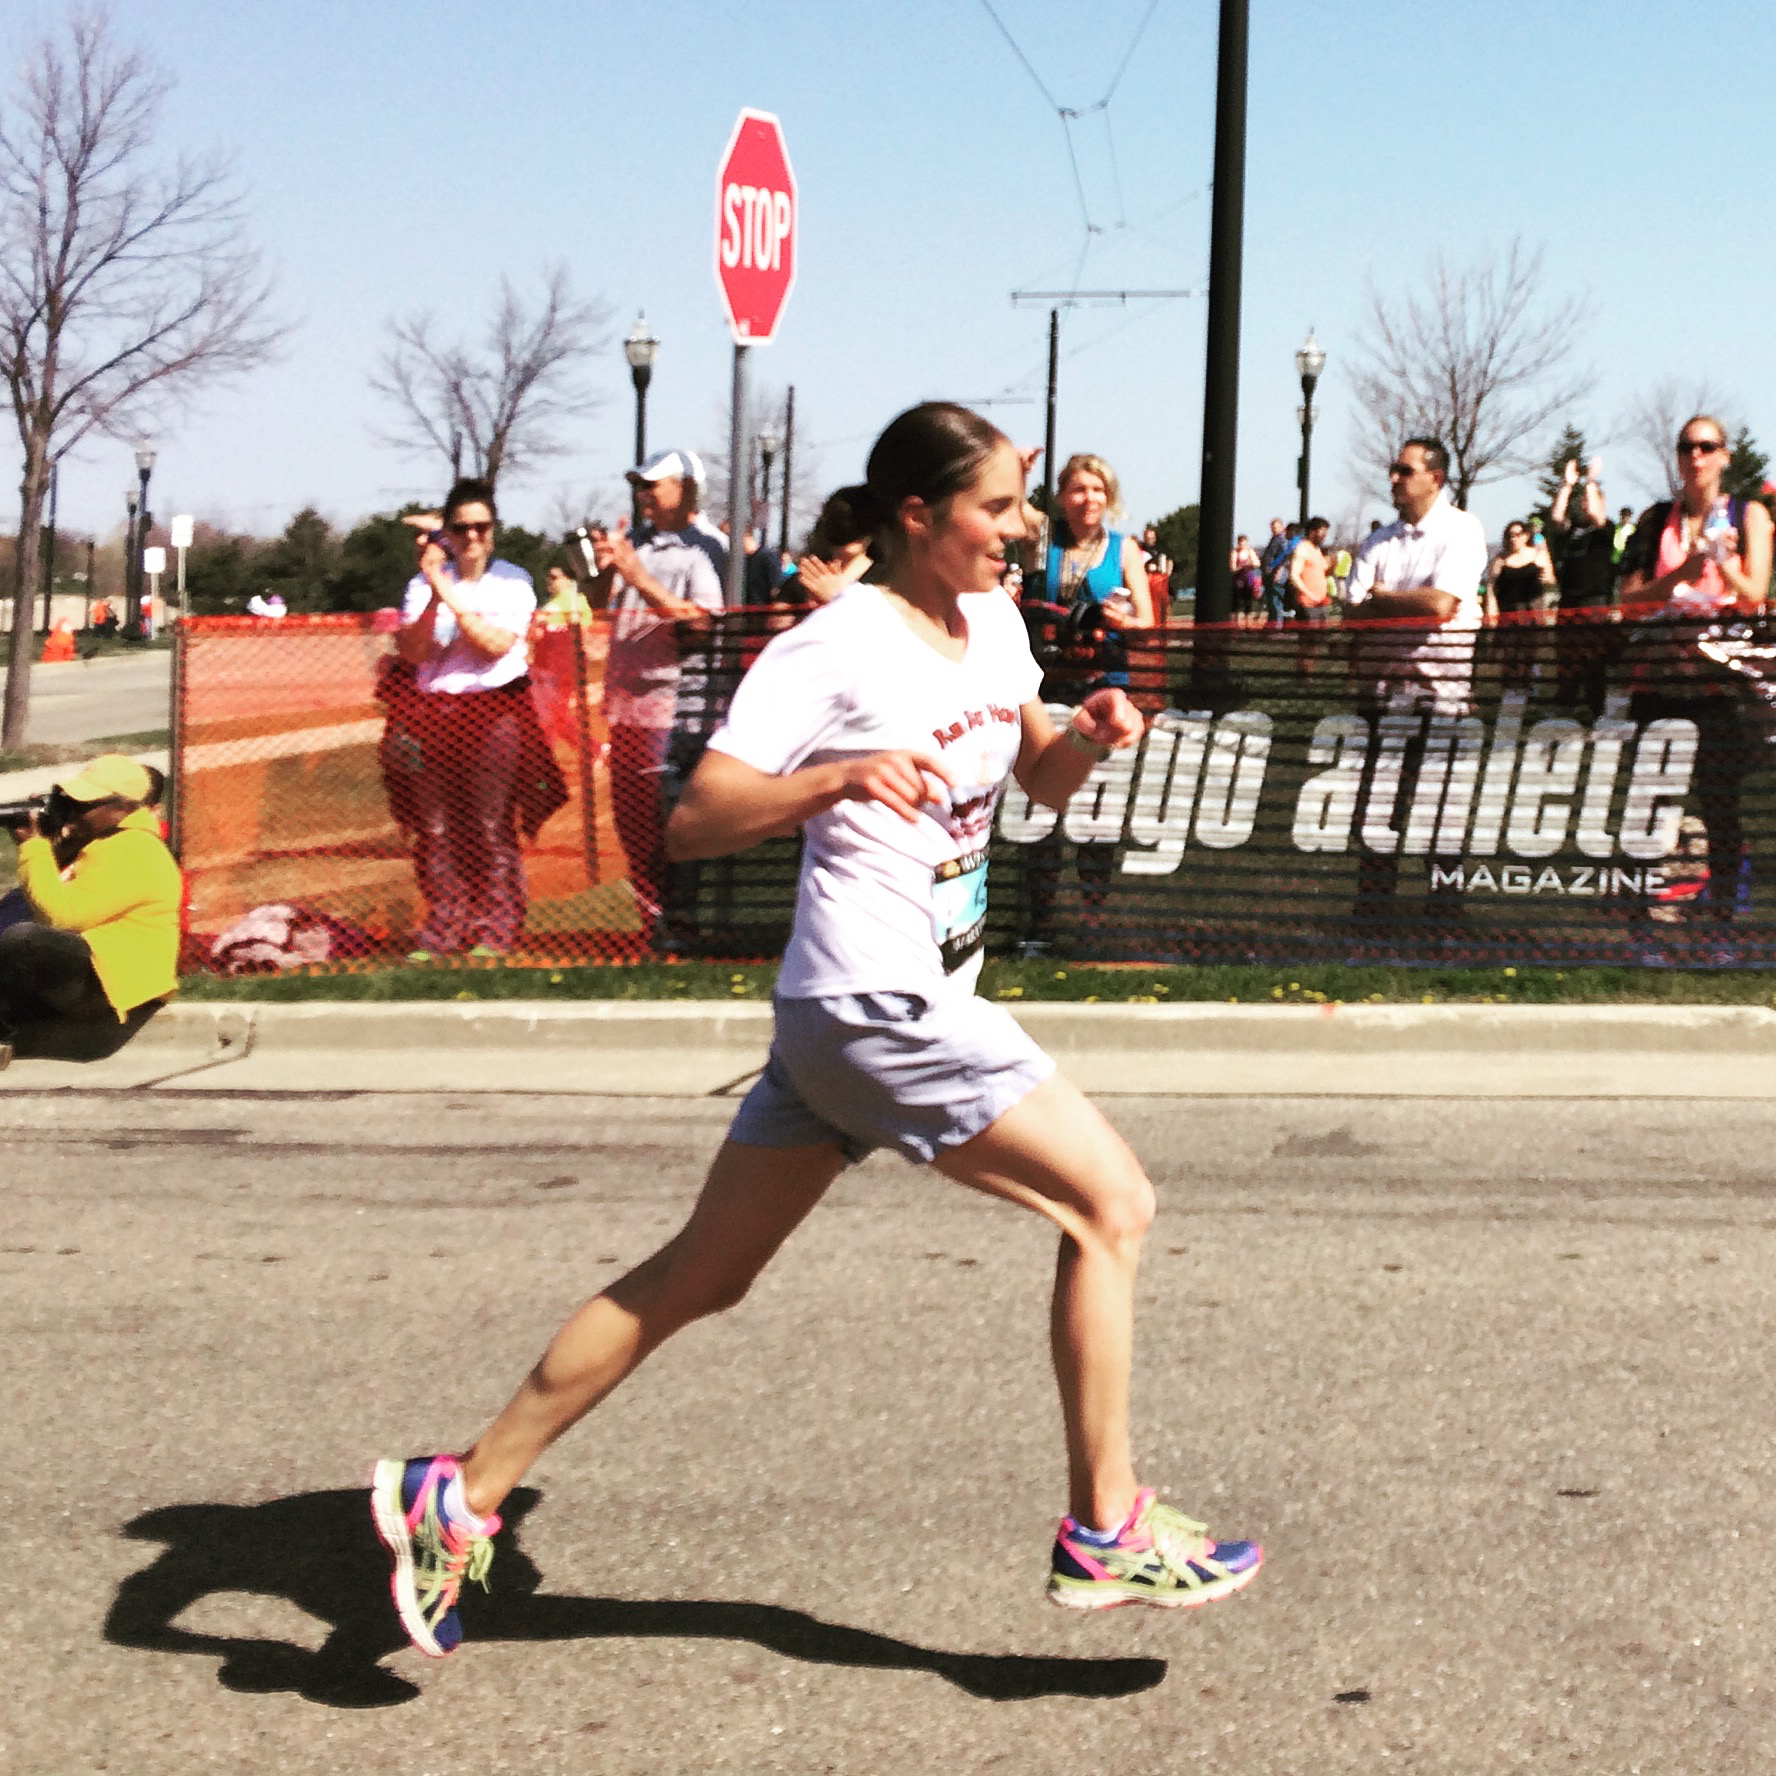 Lillie Romeiser prepares to run the New York City Marathon